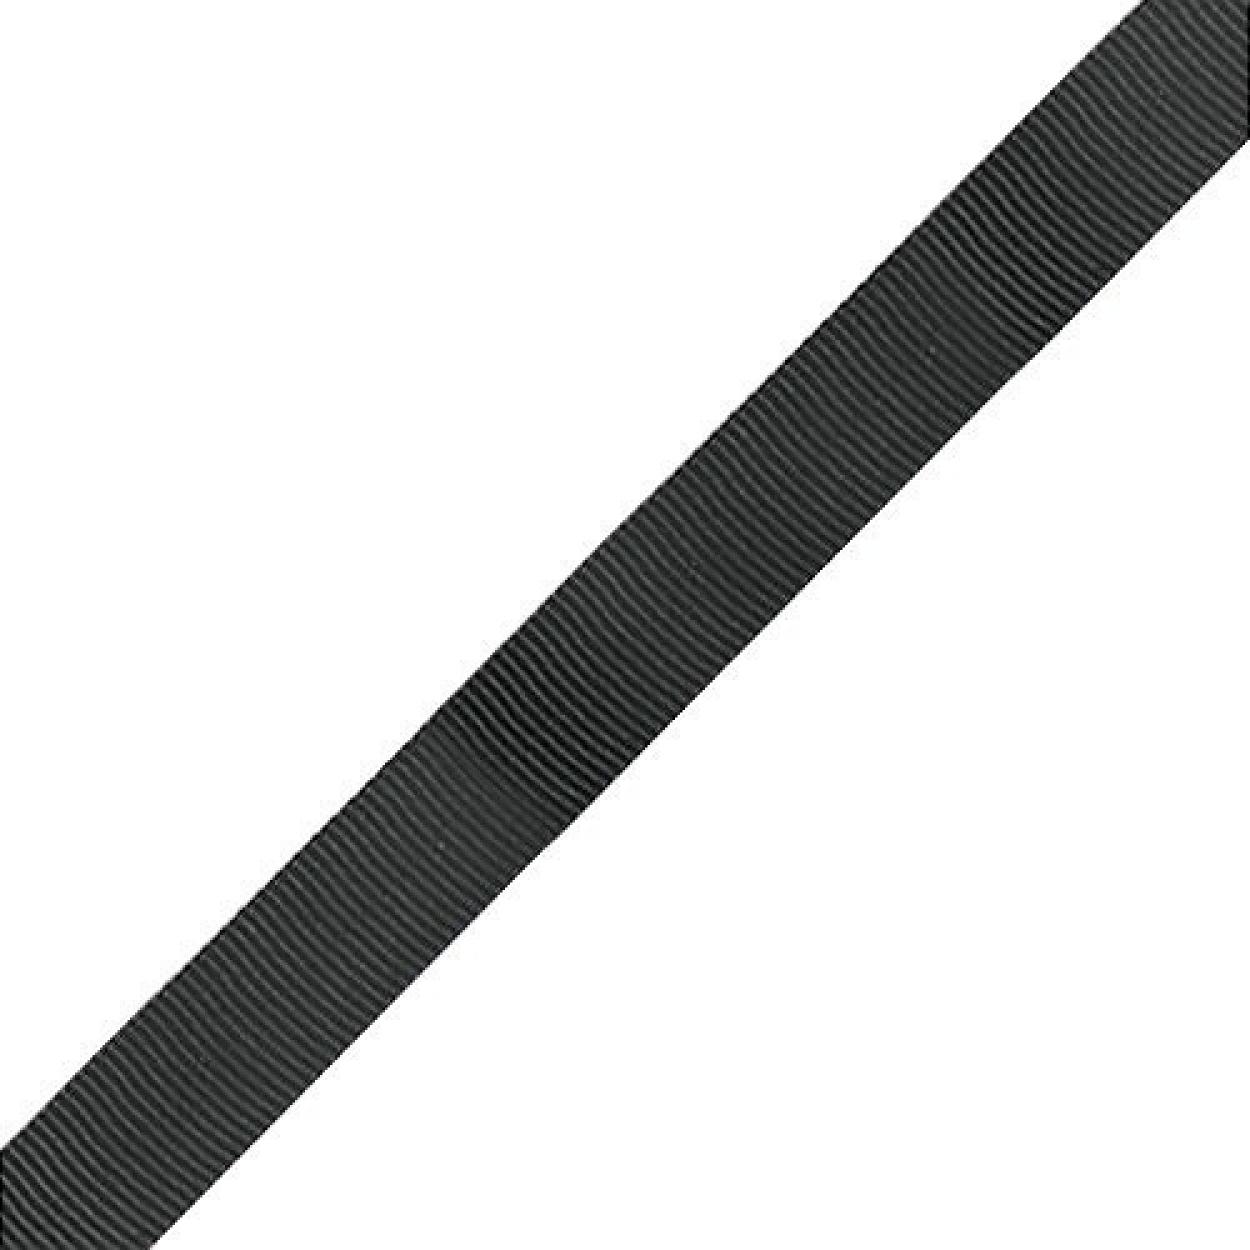 Image of 1 in. Climb-Spec - 300' Spool